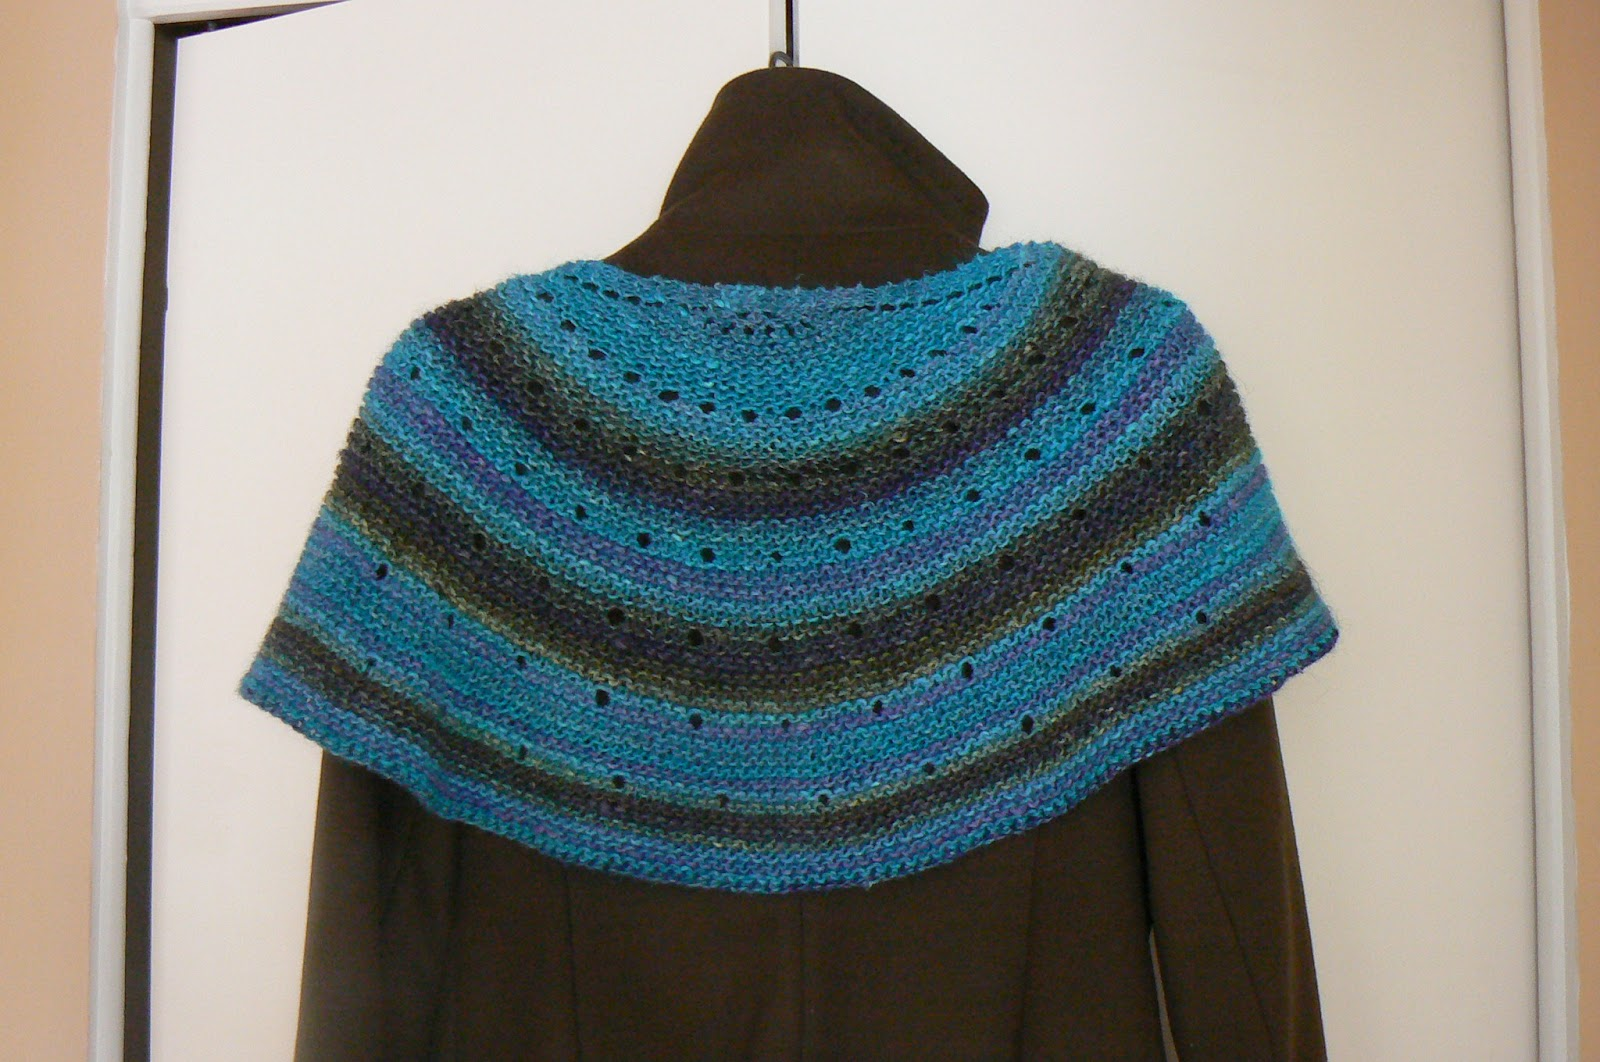 Chrissies Knit Times Silk Moon Crescent Shawl